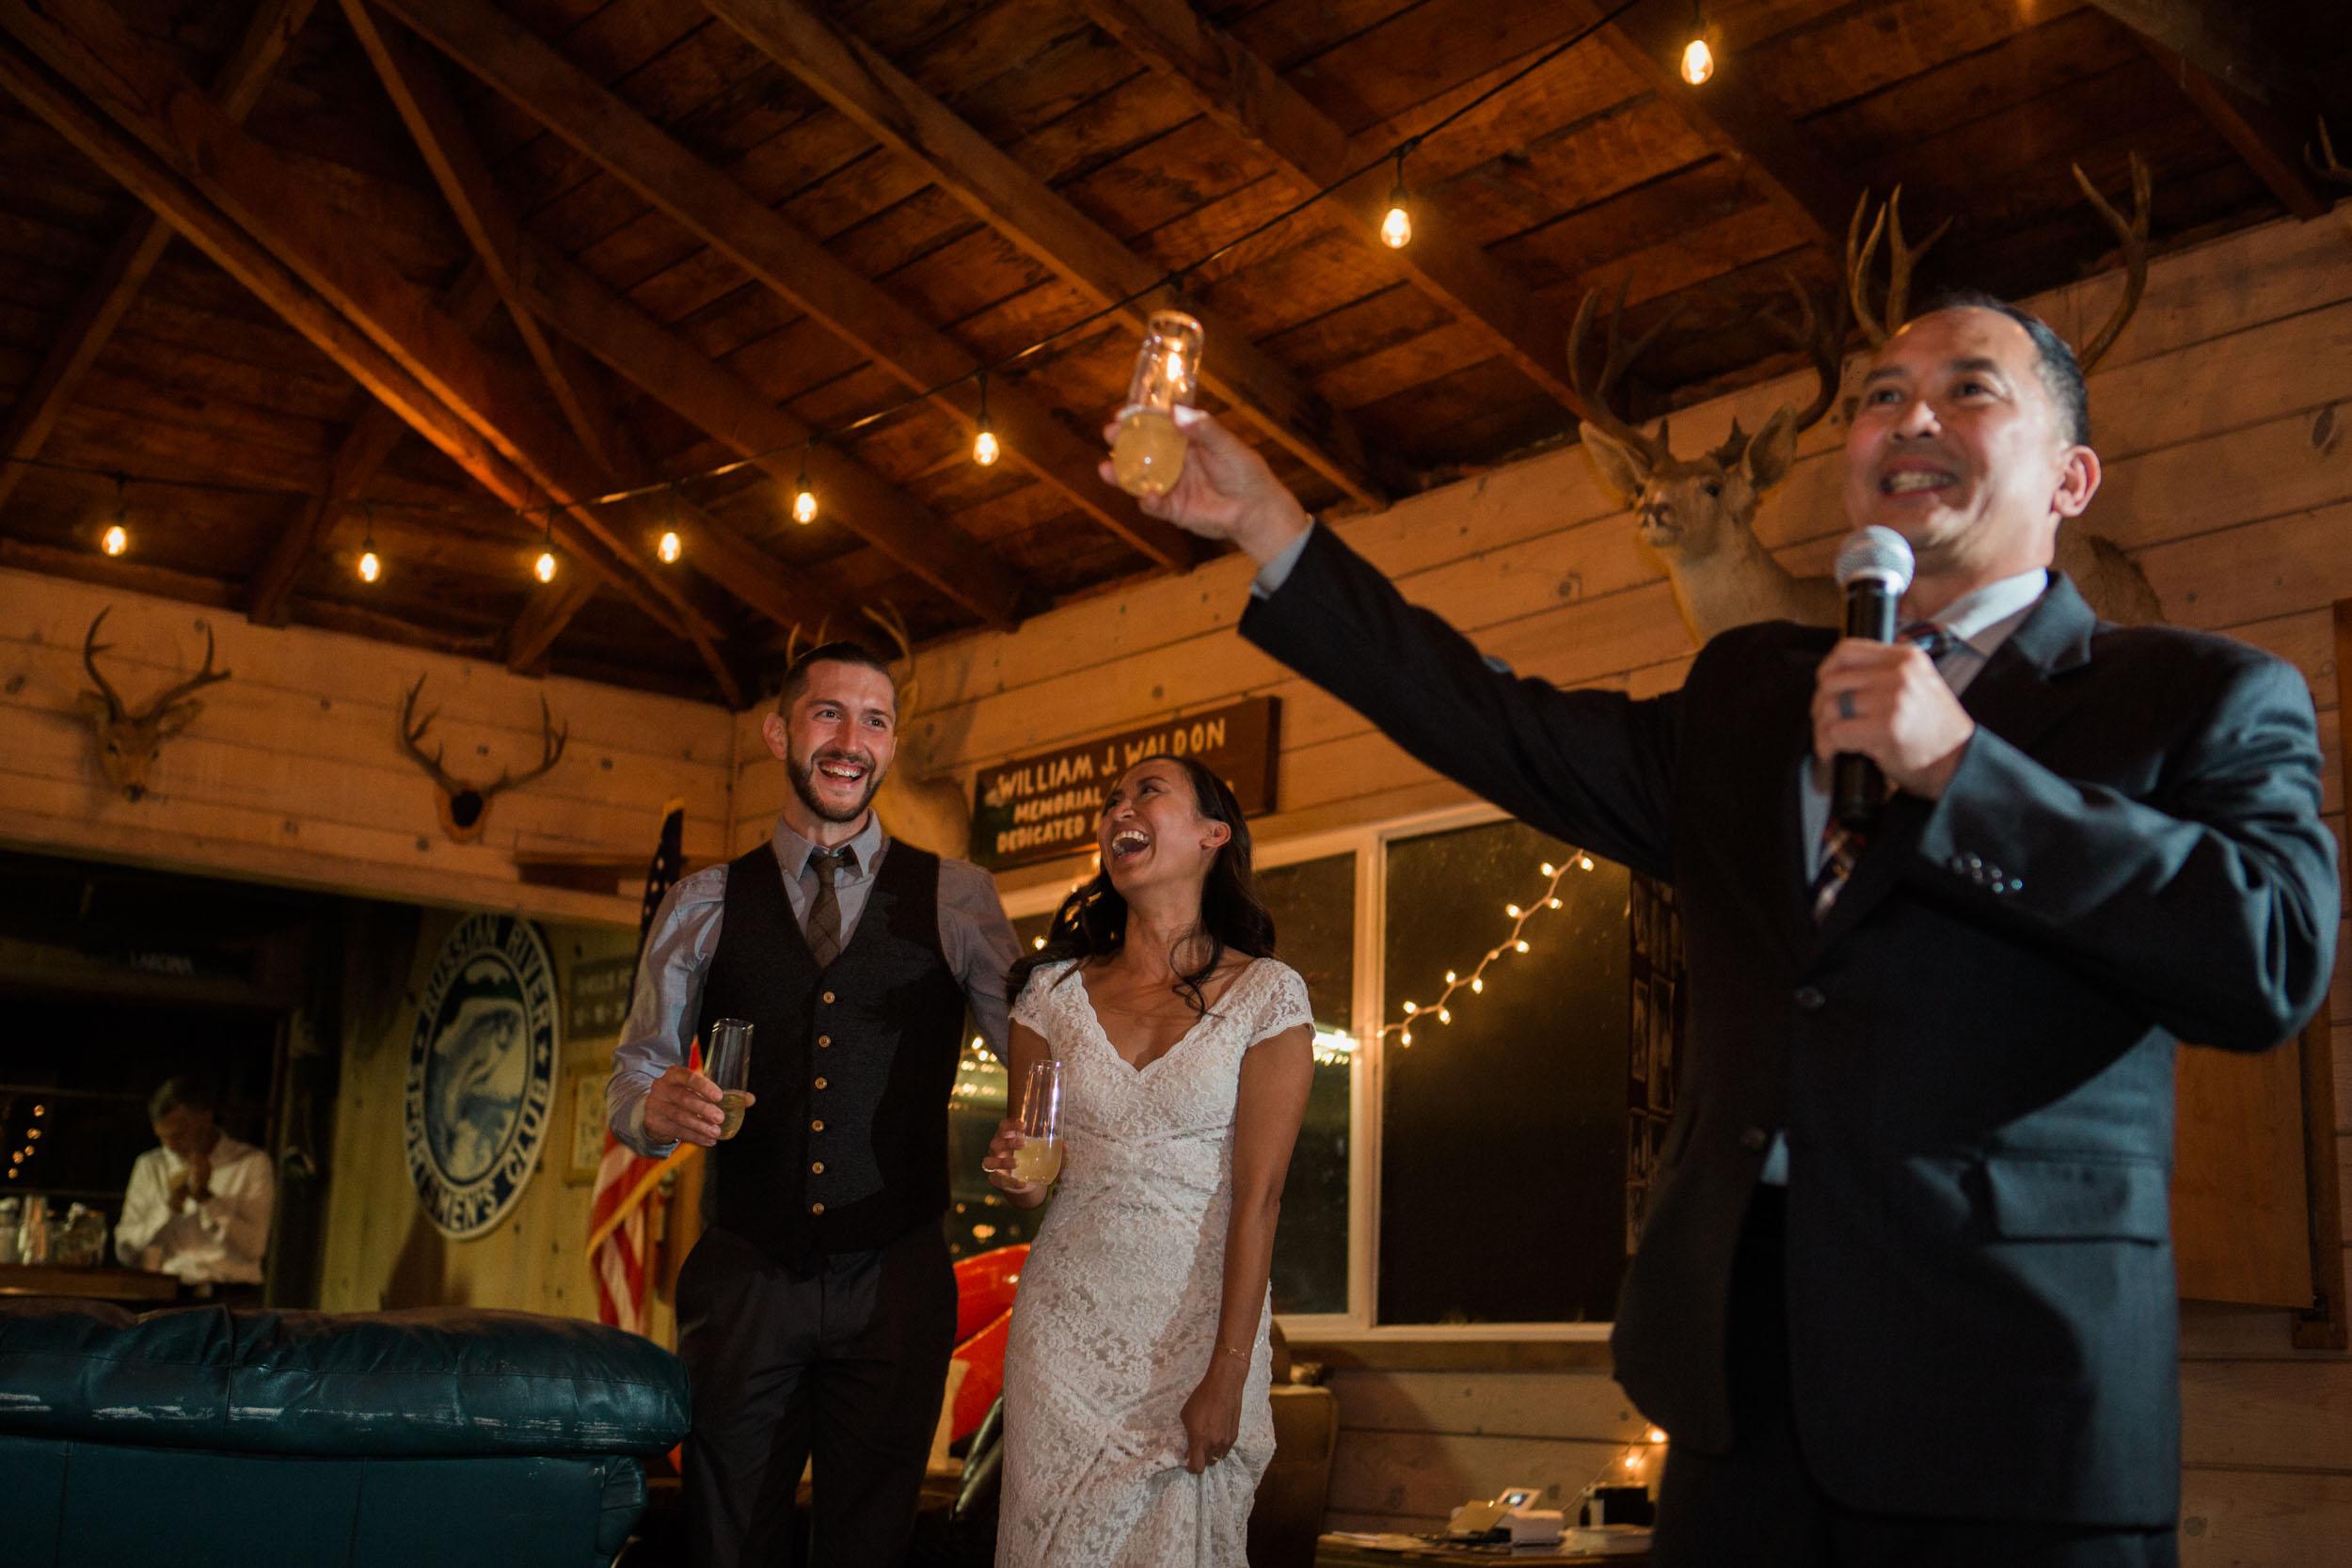 BKM-Photography-Russian-River-Wedding-Redwoods-Guerneville-California-Destination-Wedding-Photographer-0123.jpg